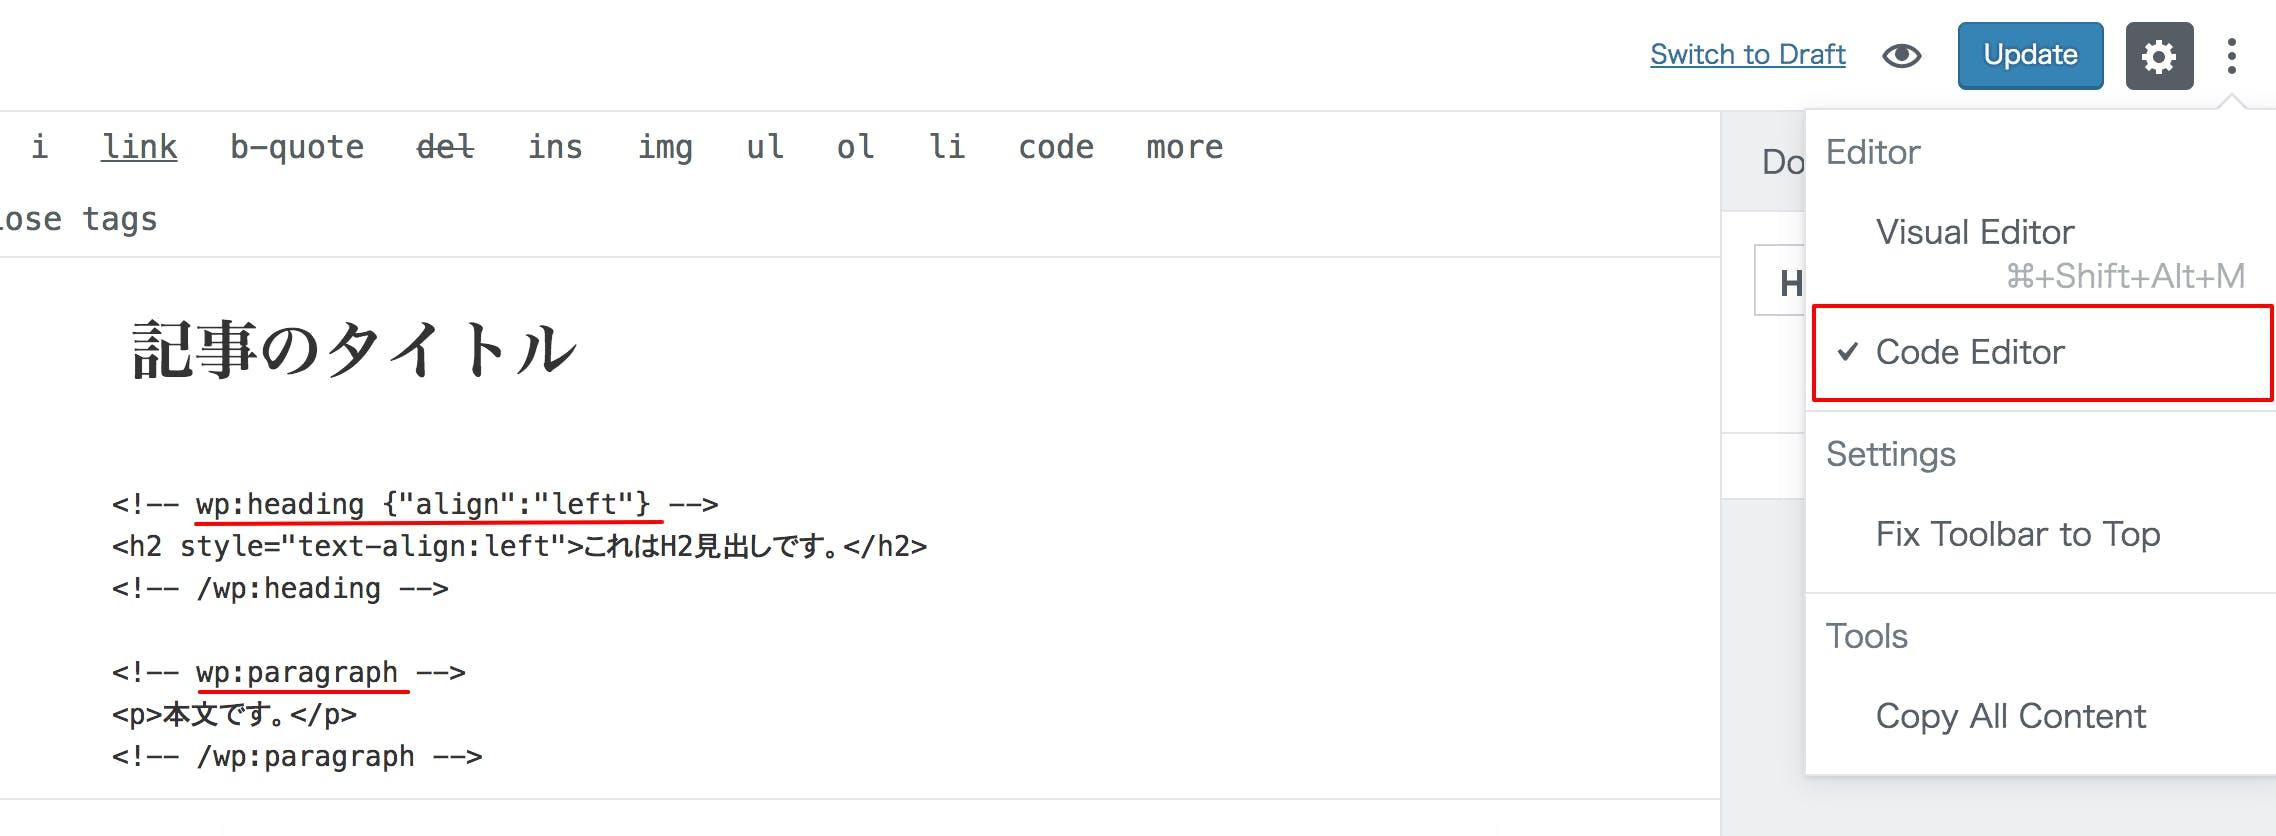 gutenberg_editor_code_view.png